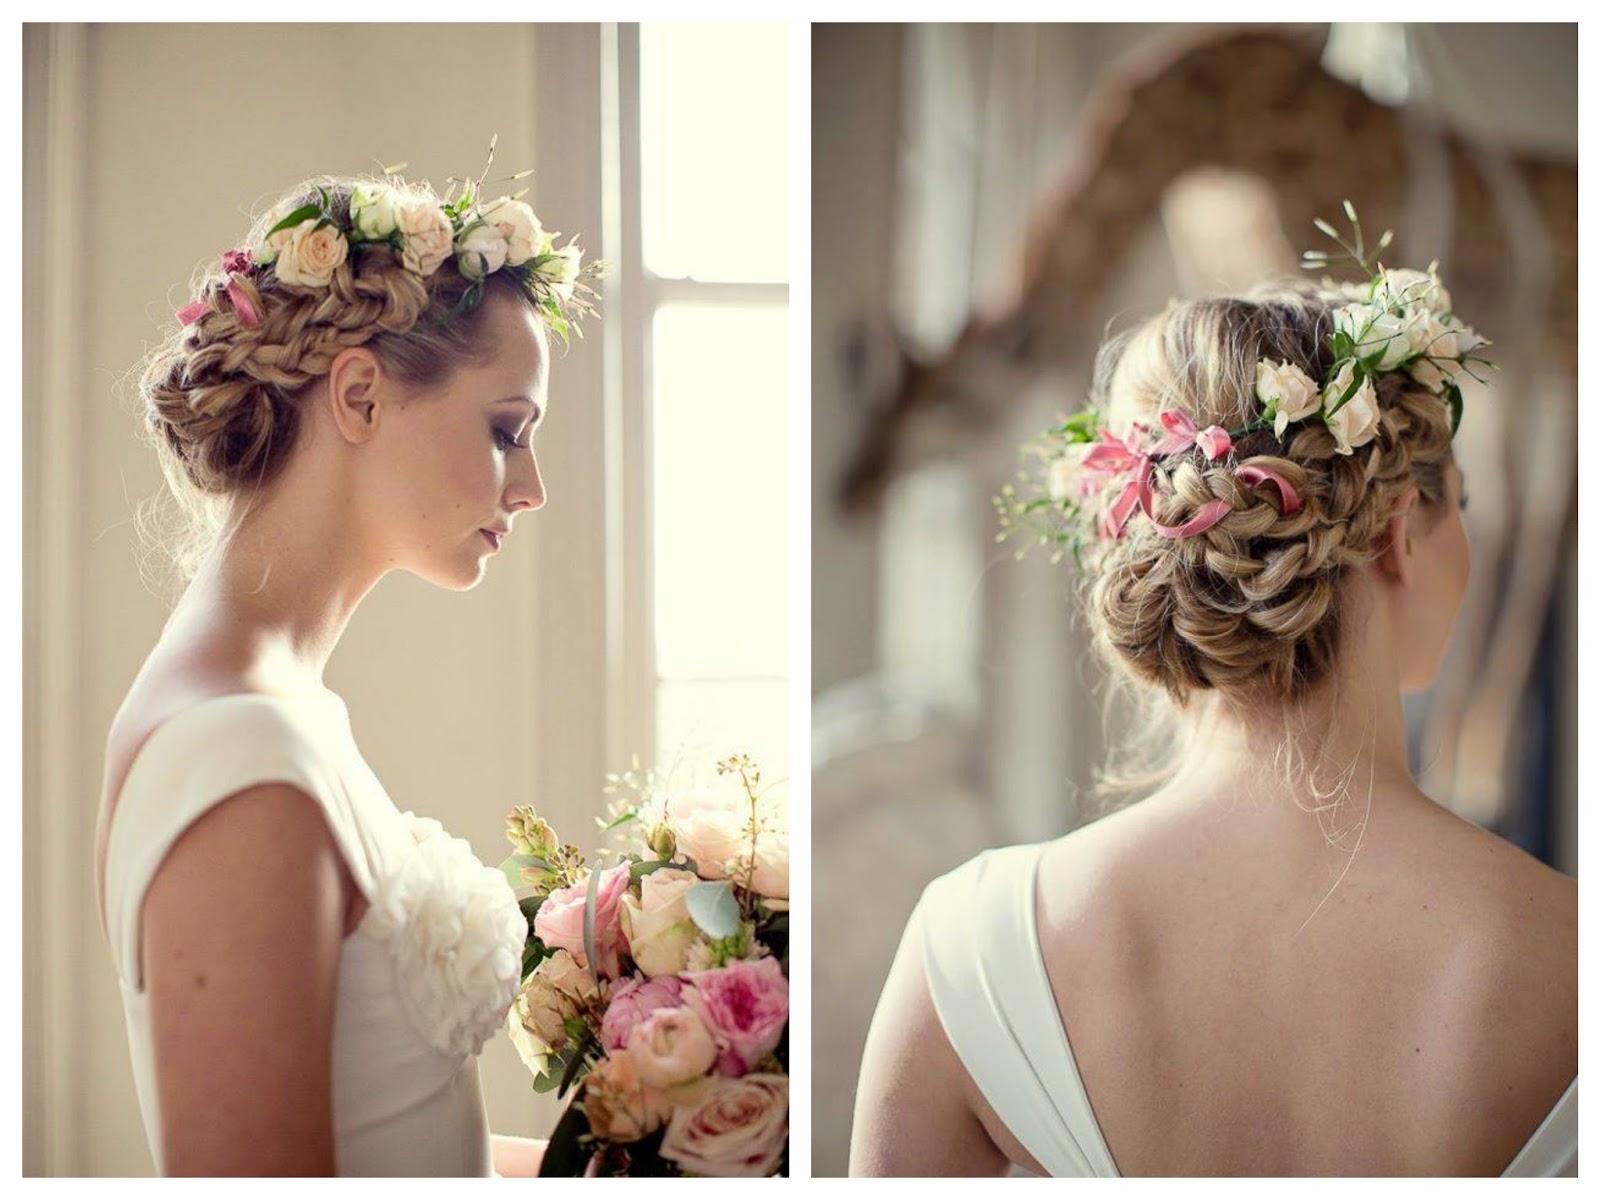 Peinados De Novia Con Flores Naturales Elainacortez